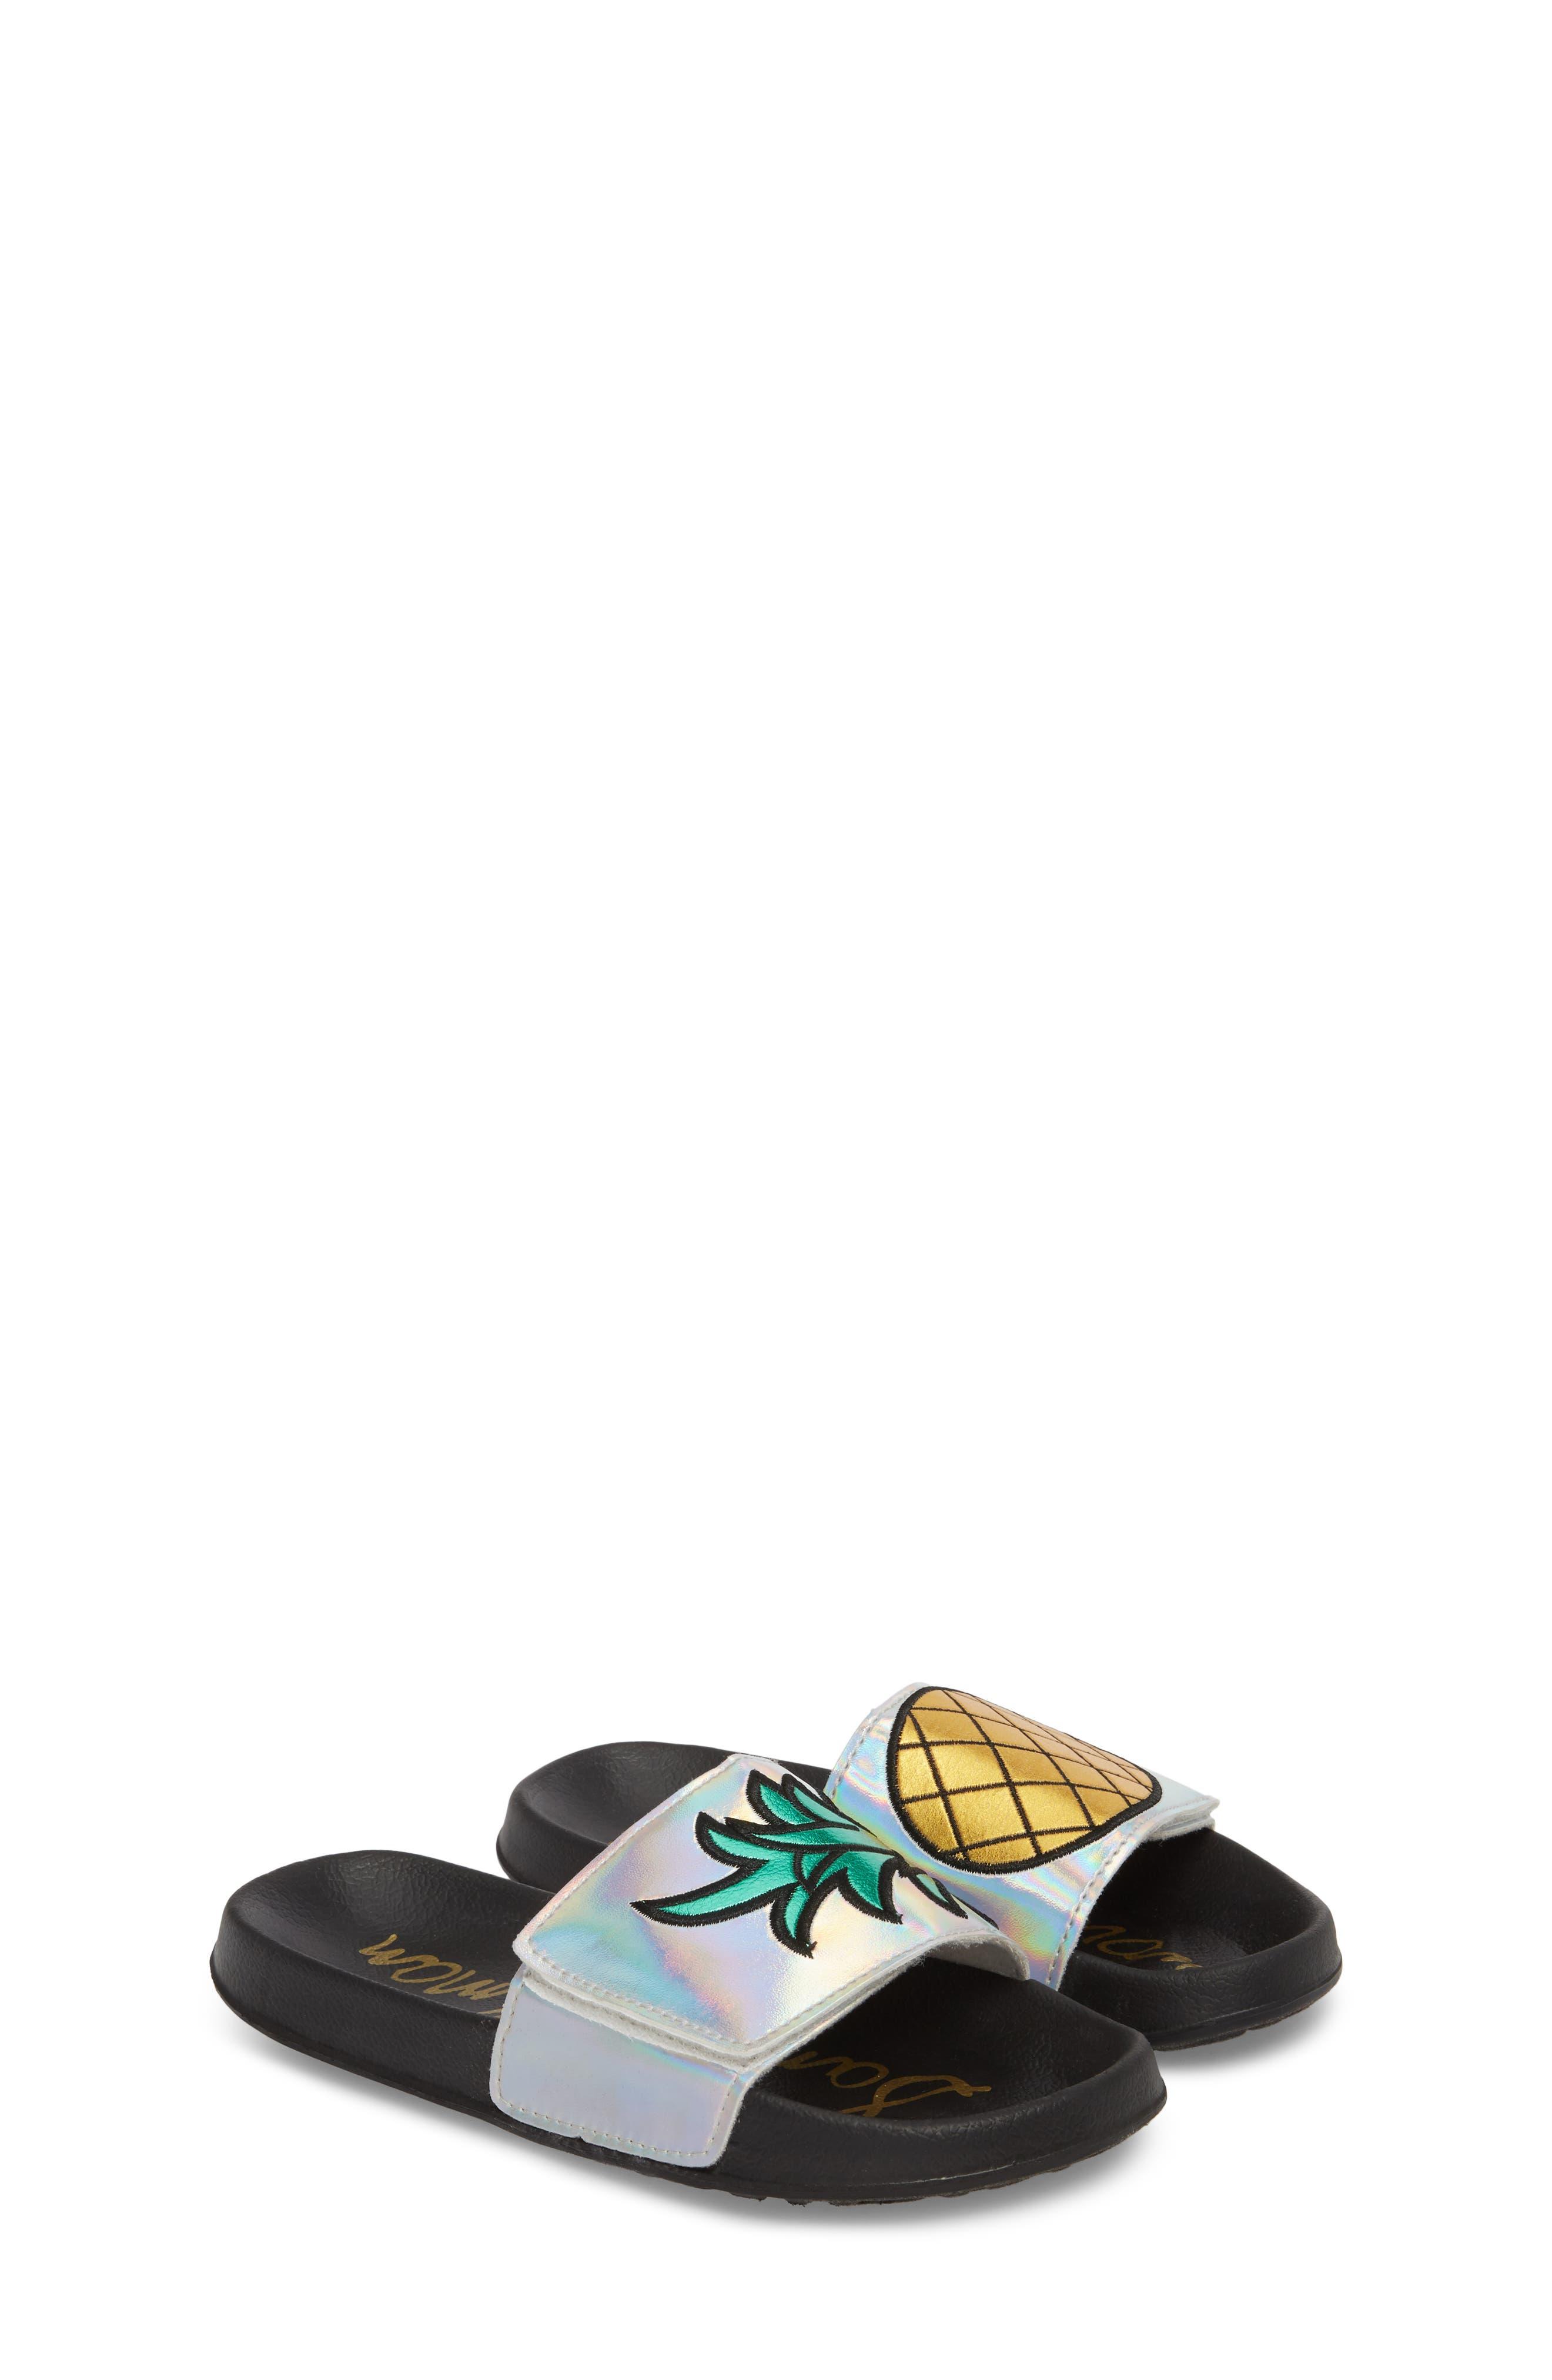 Mackie Pineapple Metallic Slide Sandal,                             Alternate thumbnail 2, color,                             Silver Holographic Leather